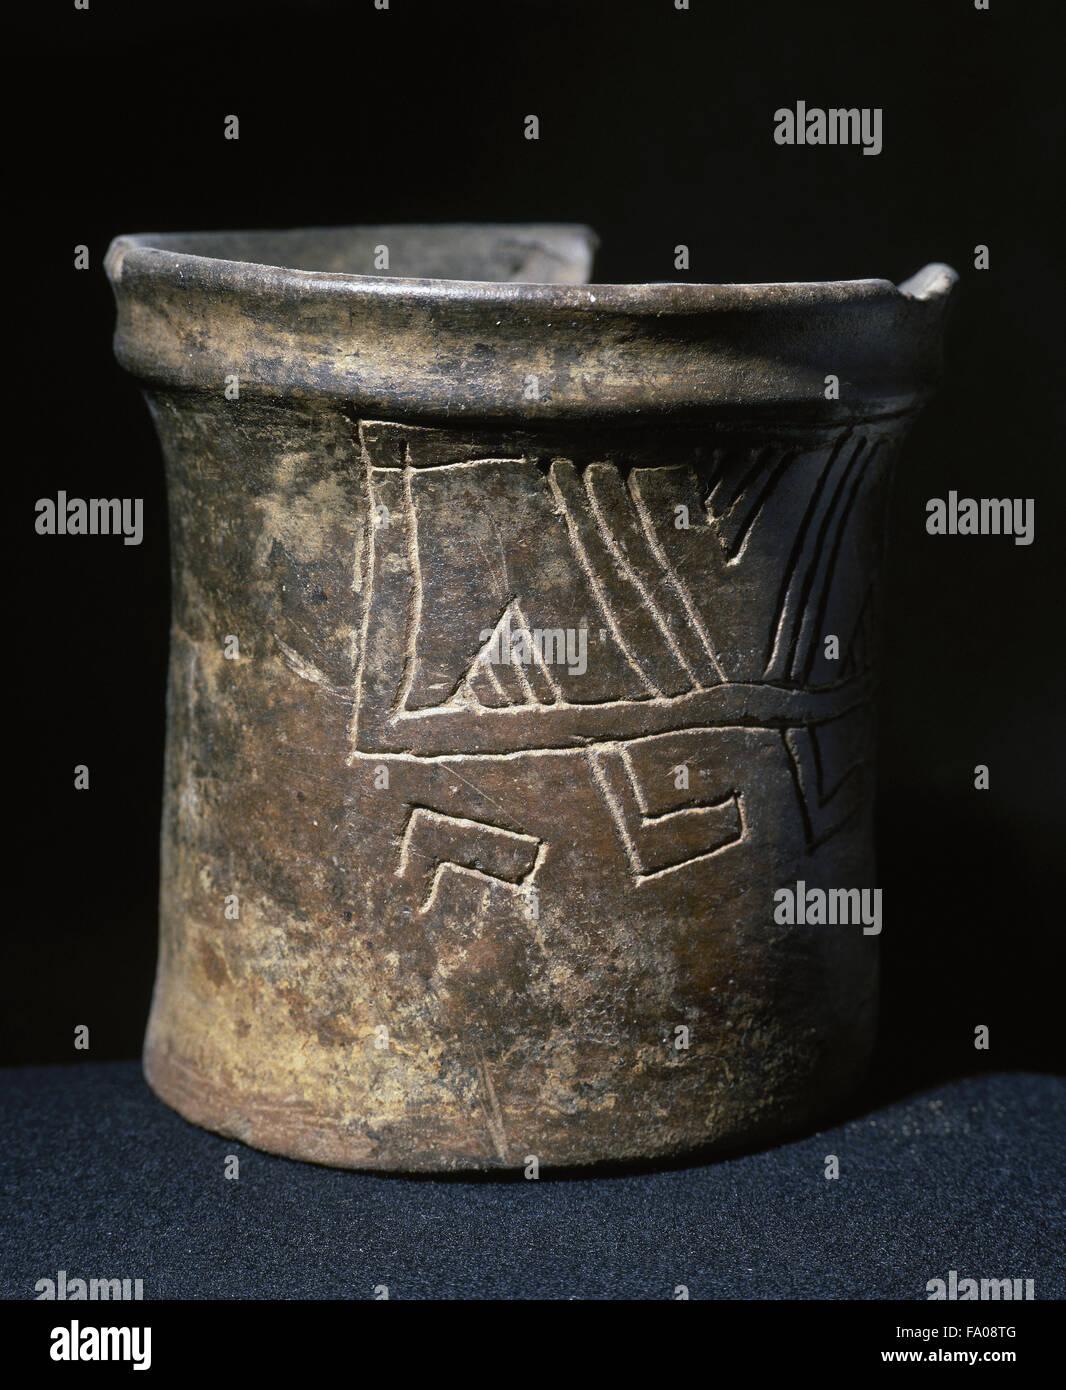 Pre-Colombian art. Mesoamerican. Ceramic vessel. Geometric decoration. 12 x 13 cm (diameter). From Mesoamerica. - Stock Image